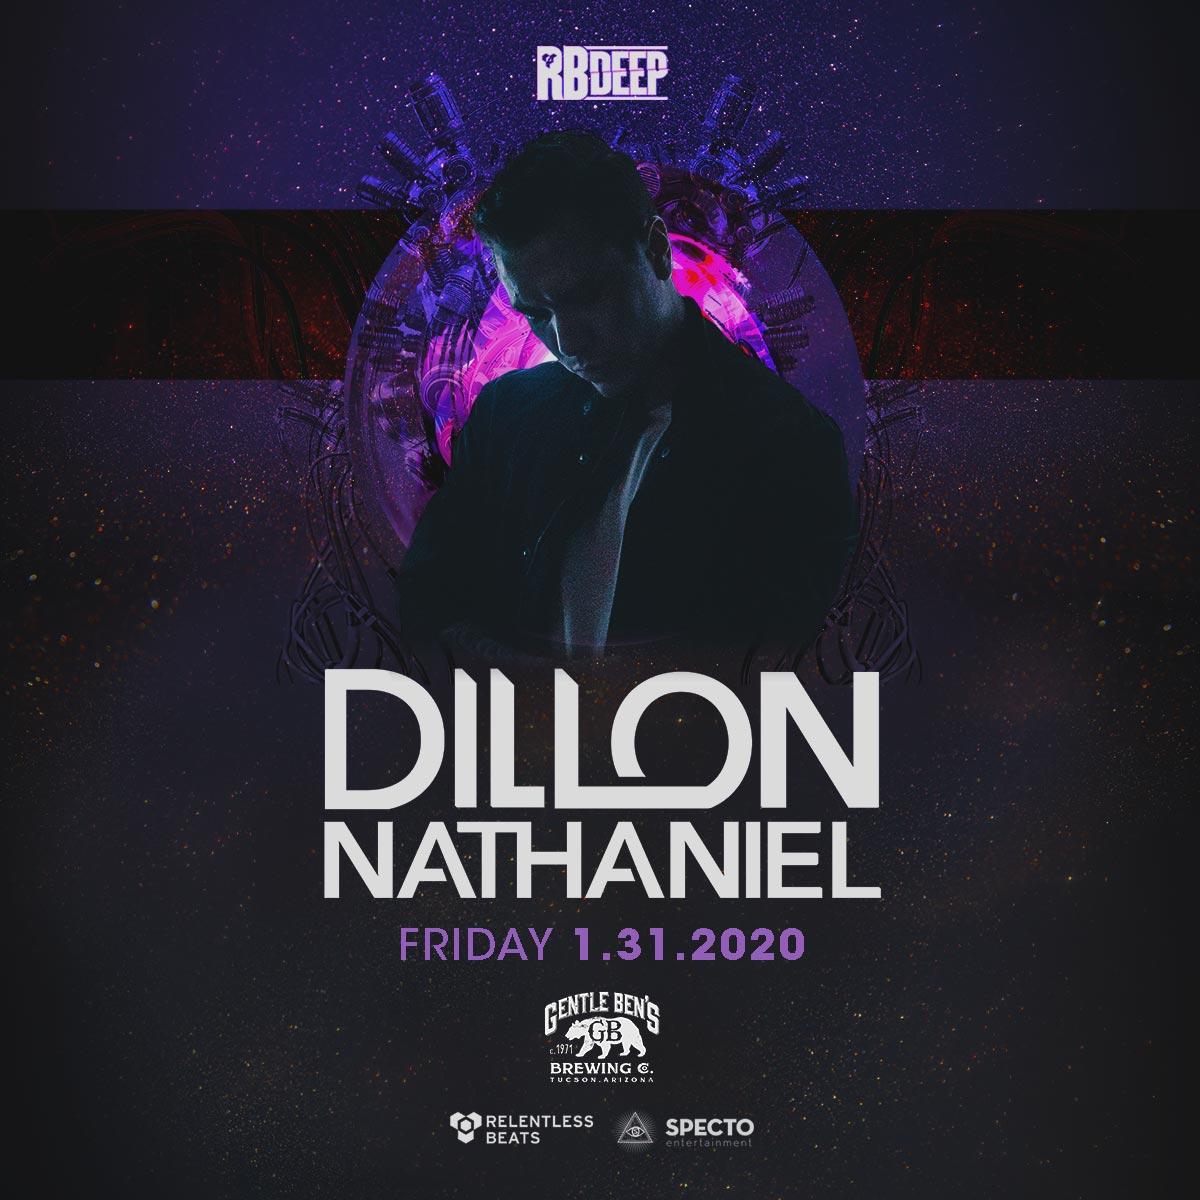 Flyer for Dillon Nathaniel